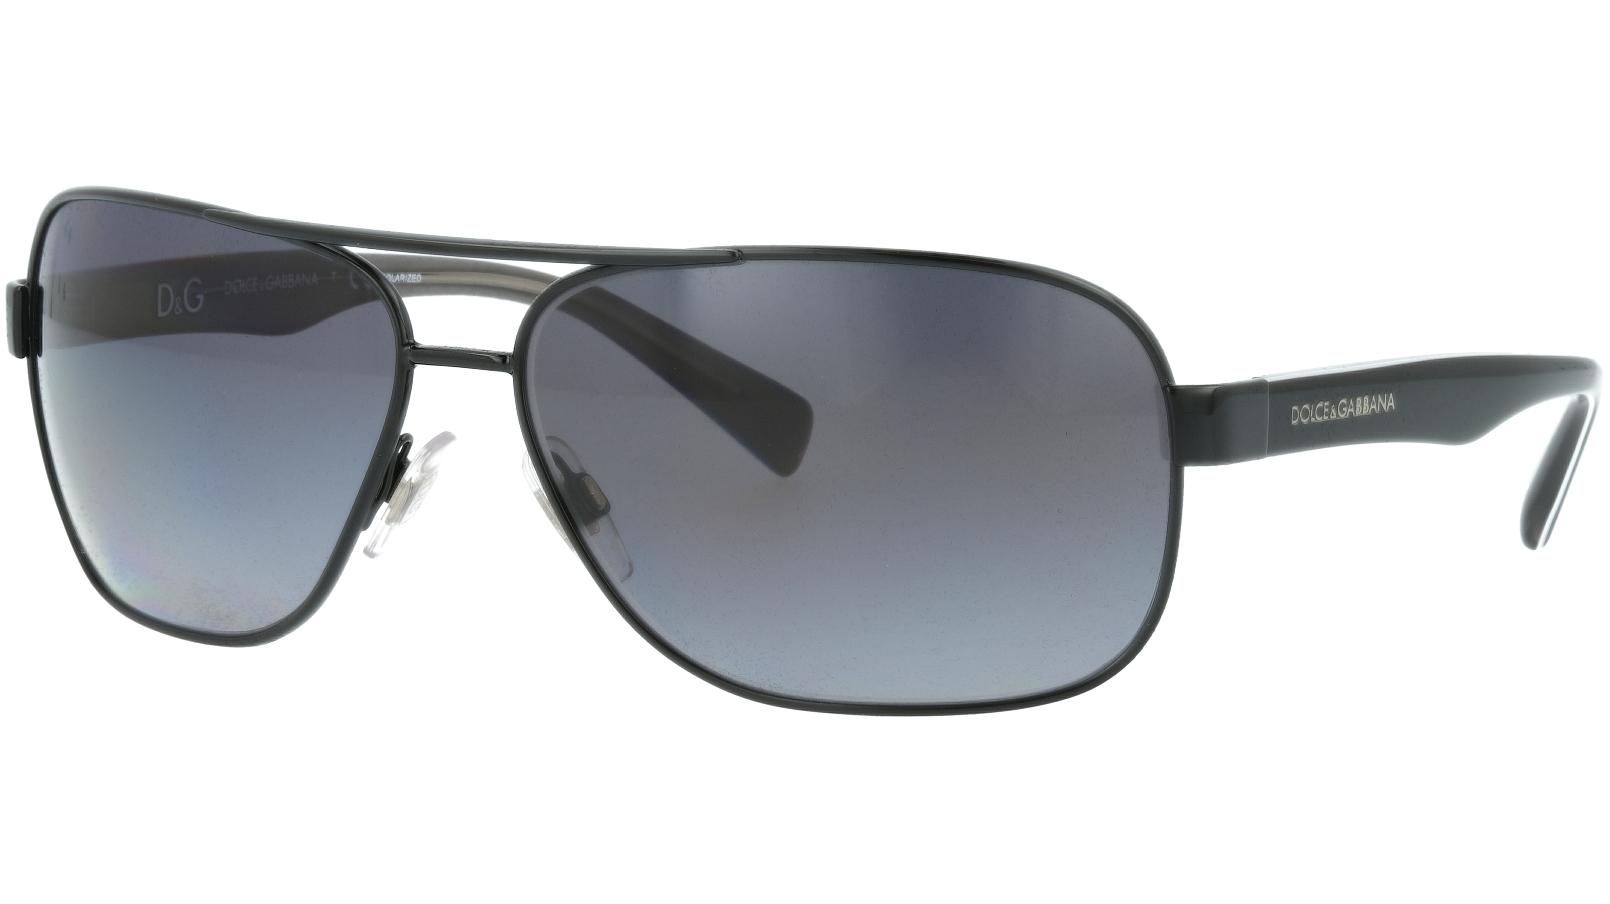 Dolce & Gabbana DG2120P 1169T3 64 Black Sunglasses